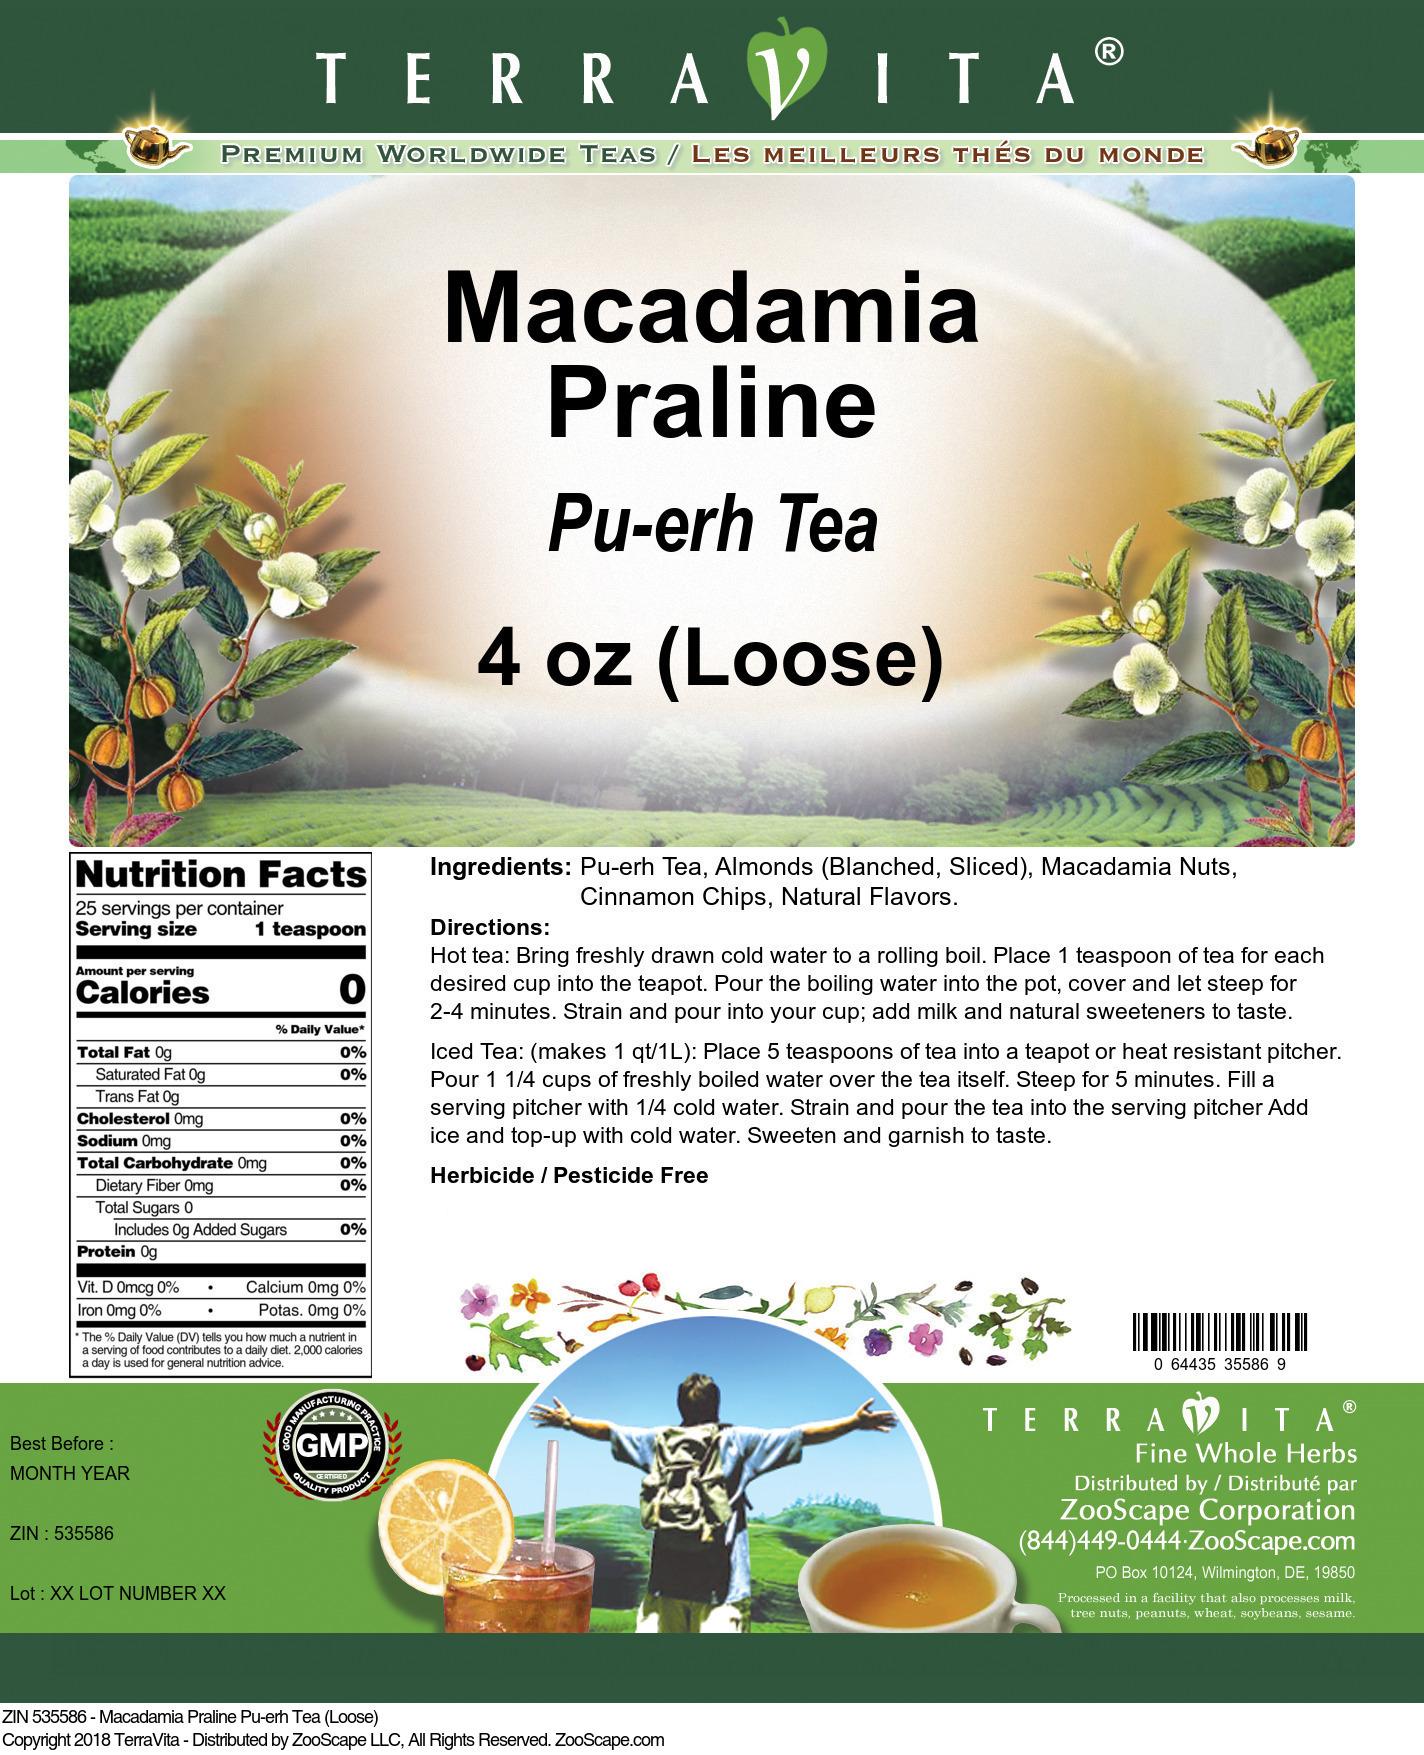 Macadamia Praline Pu-erh Tea (Loose)